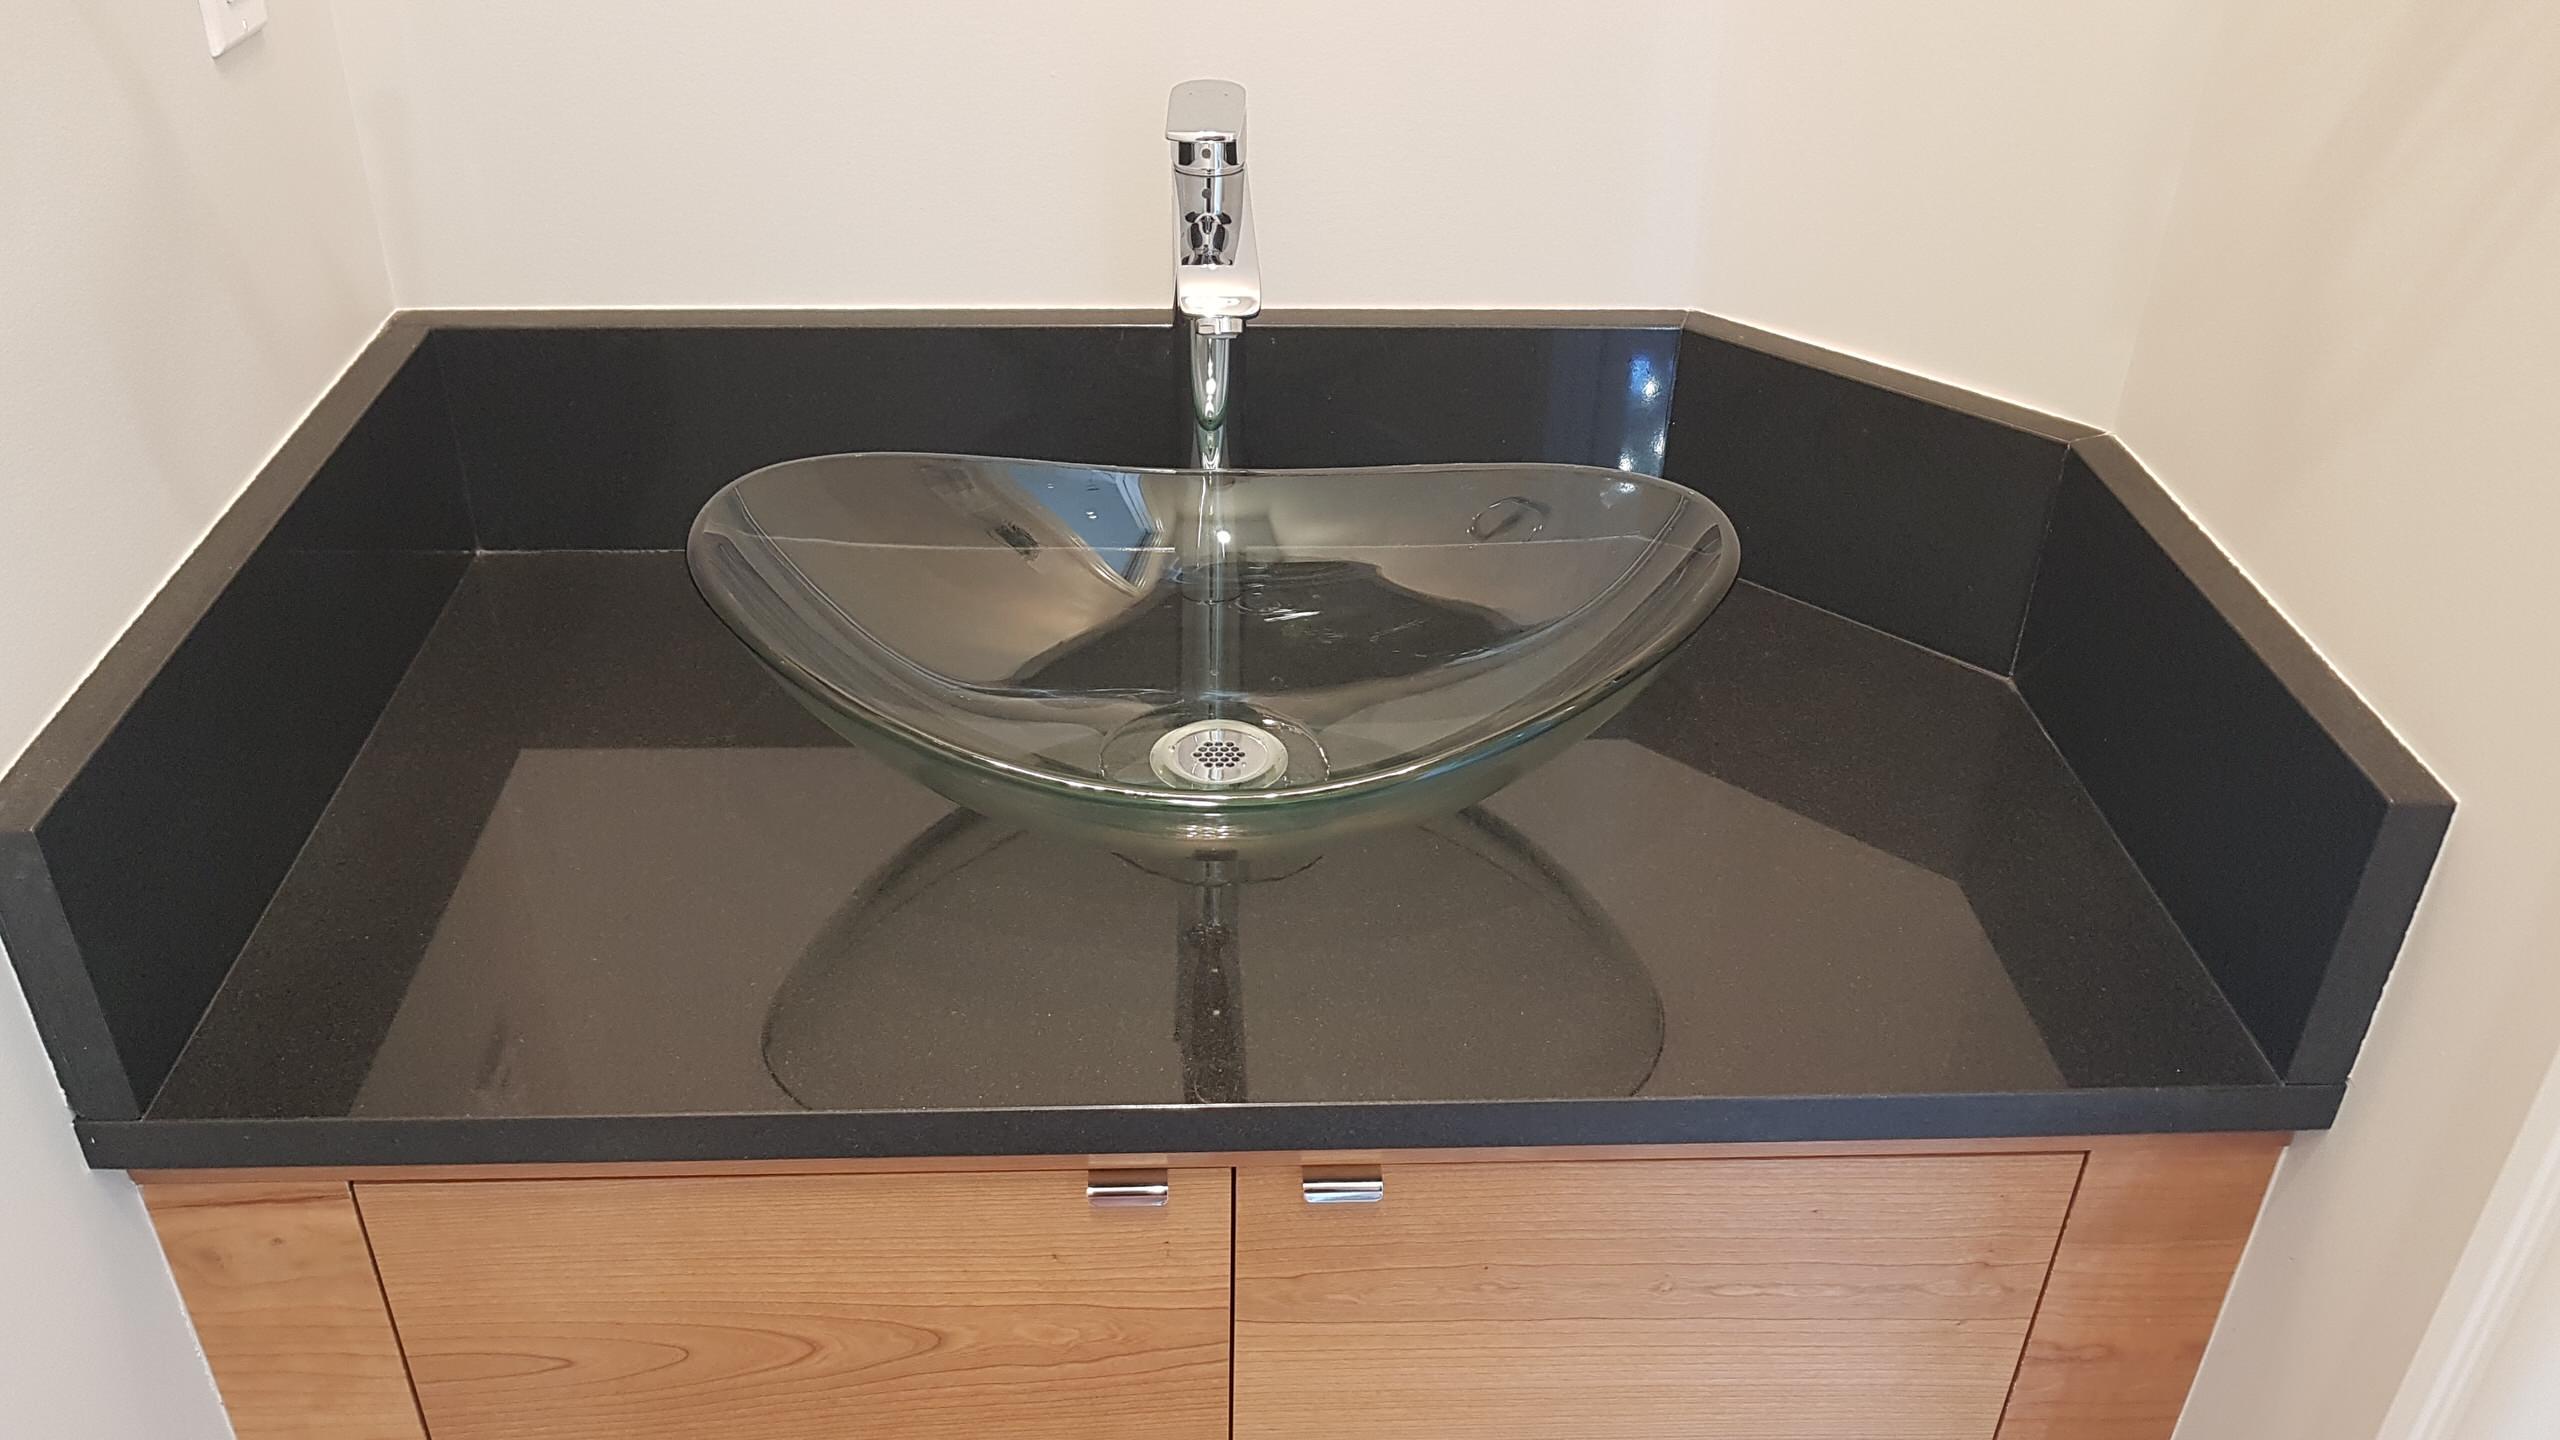 Absoulte Black Granite Vanity Countertop